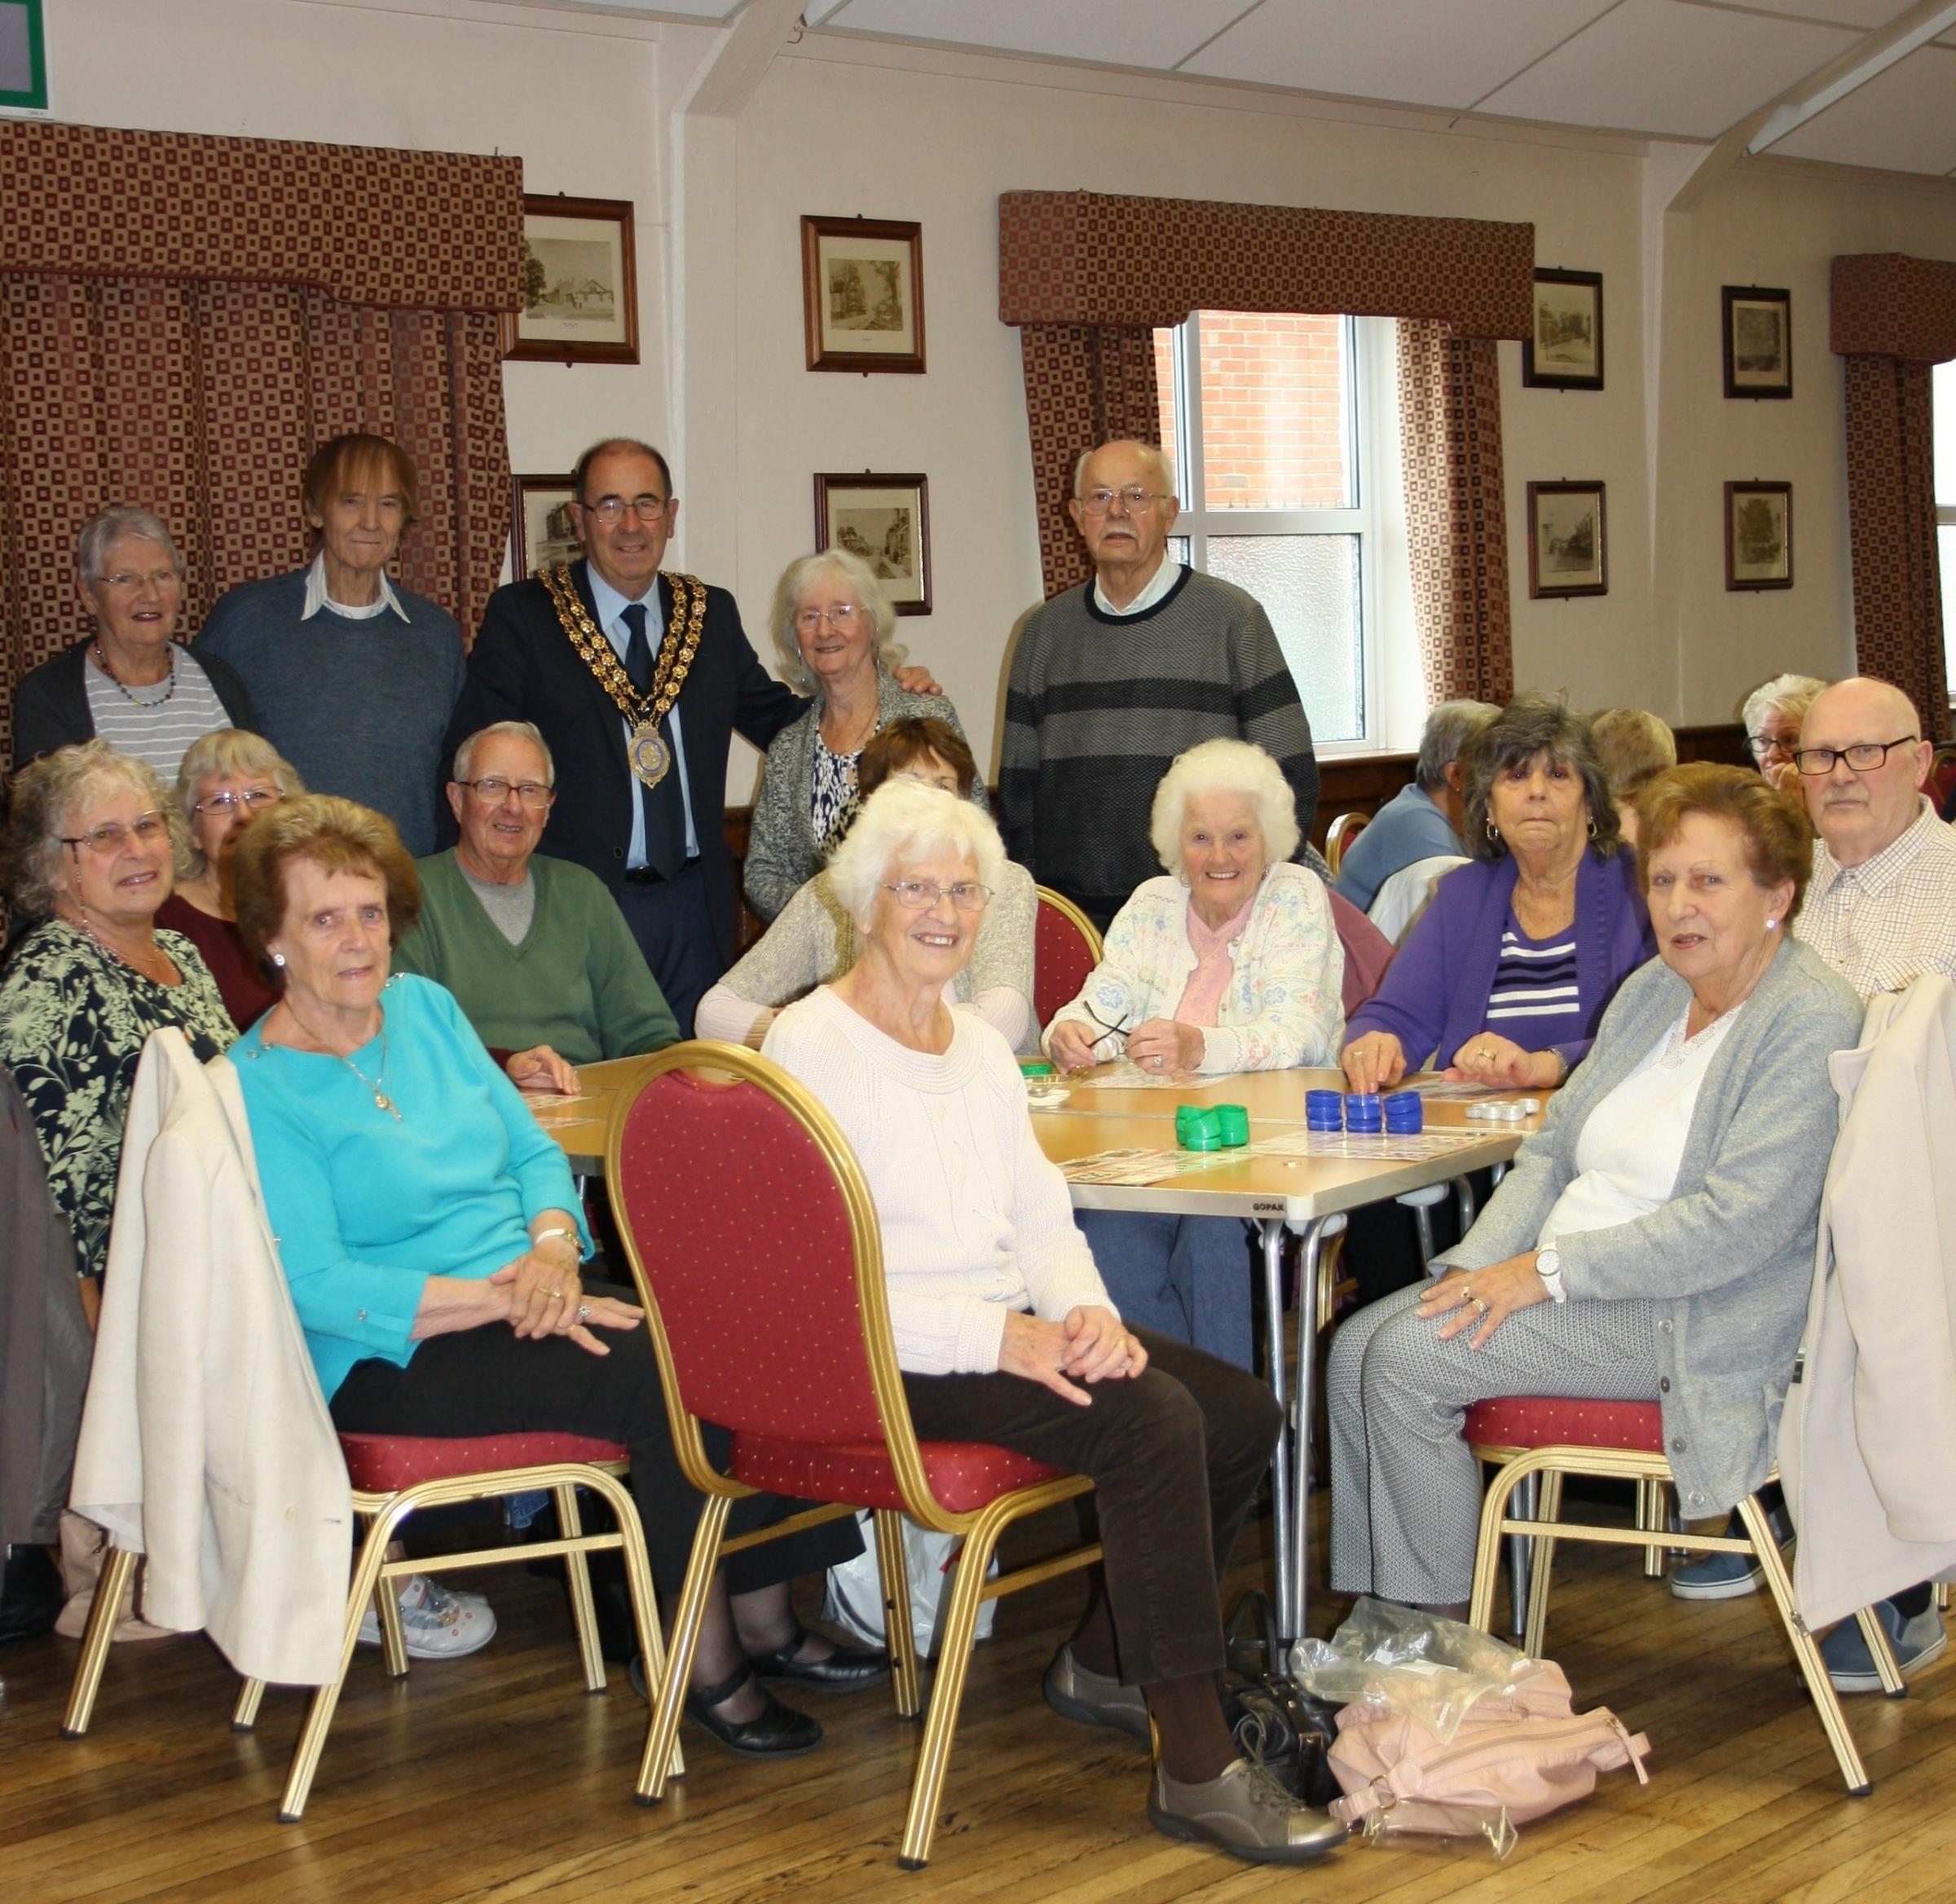 Senior citizen social groups